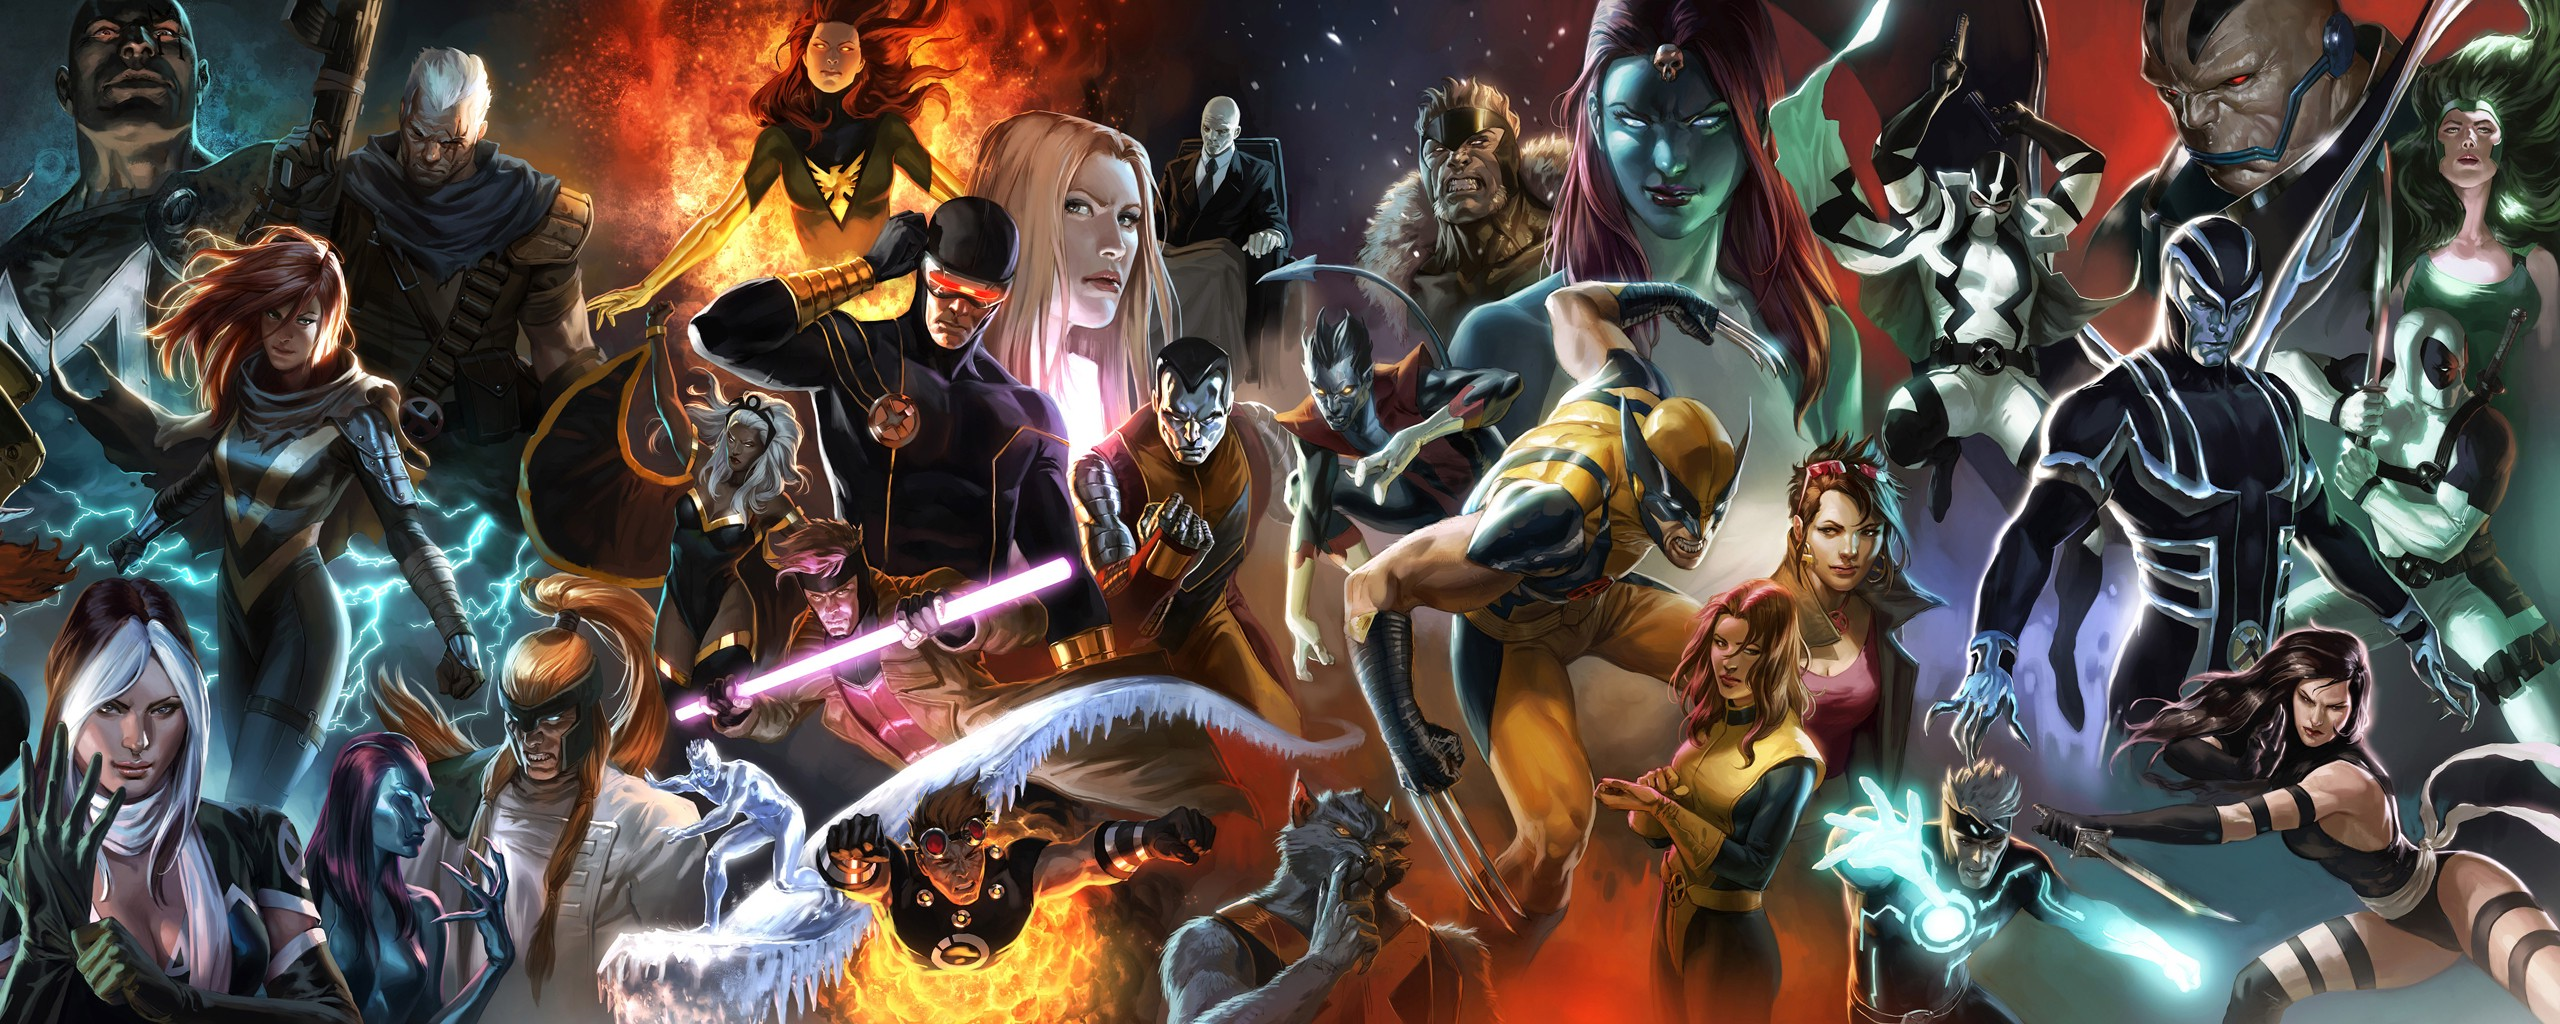 comics Marvel Comics Wolverine Cyclops Nightcrawler Beast 2560x1024